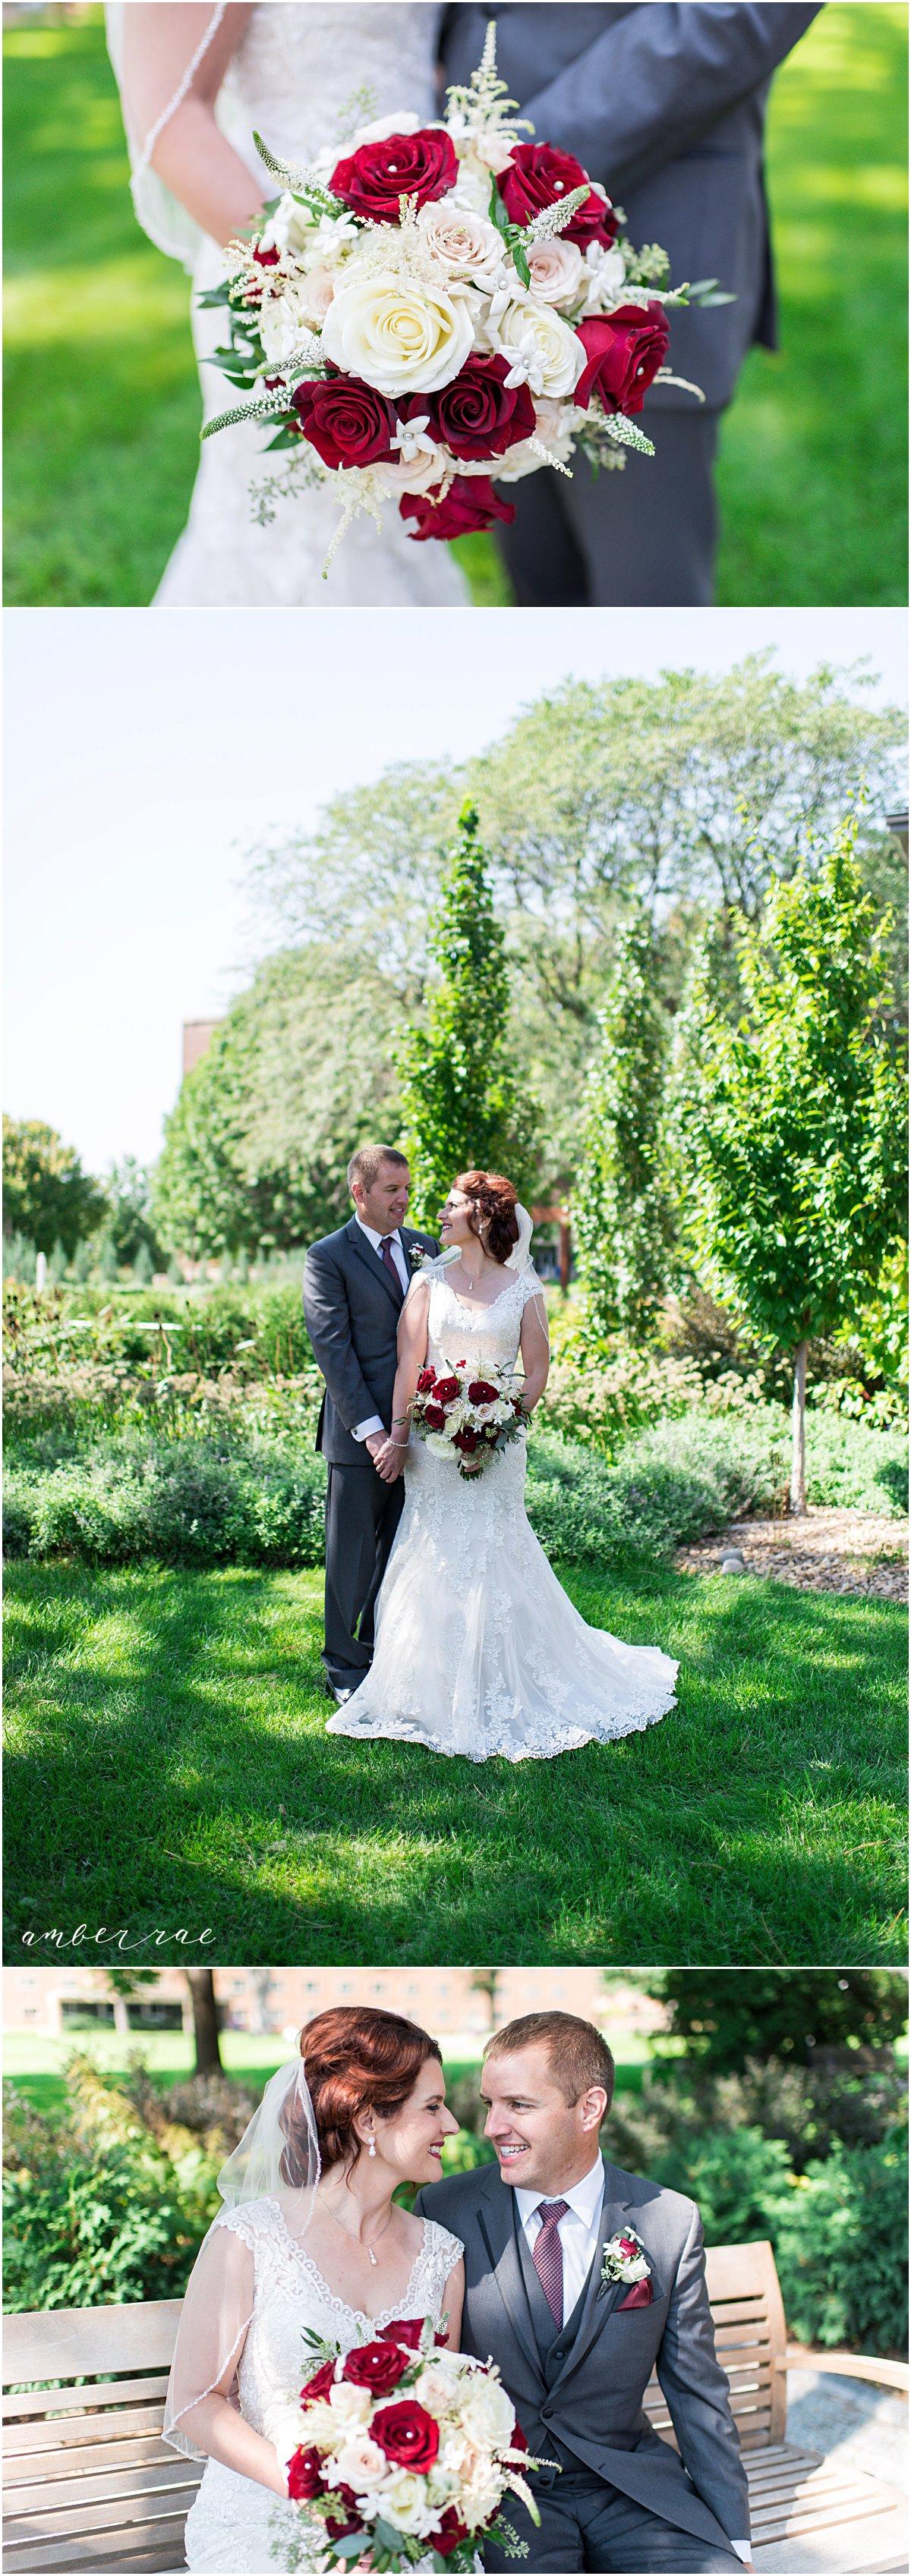 Gustafson Wedding 2018_0008.jpg